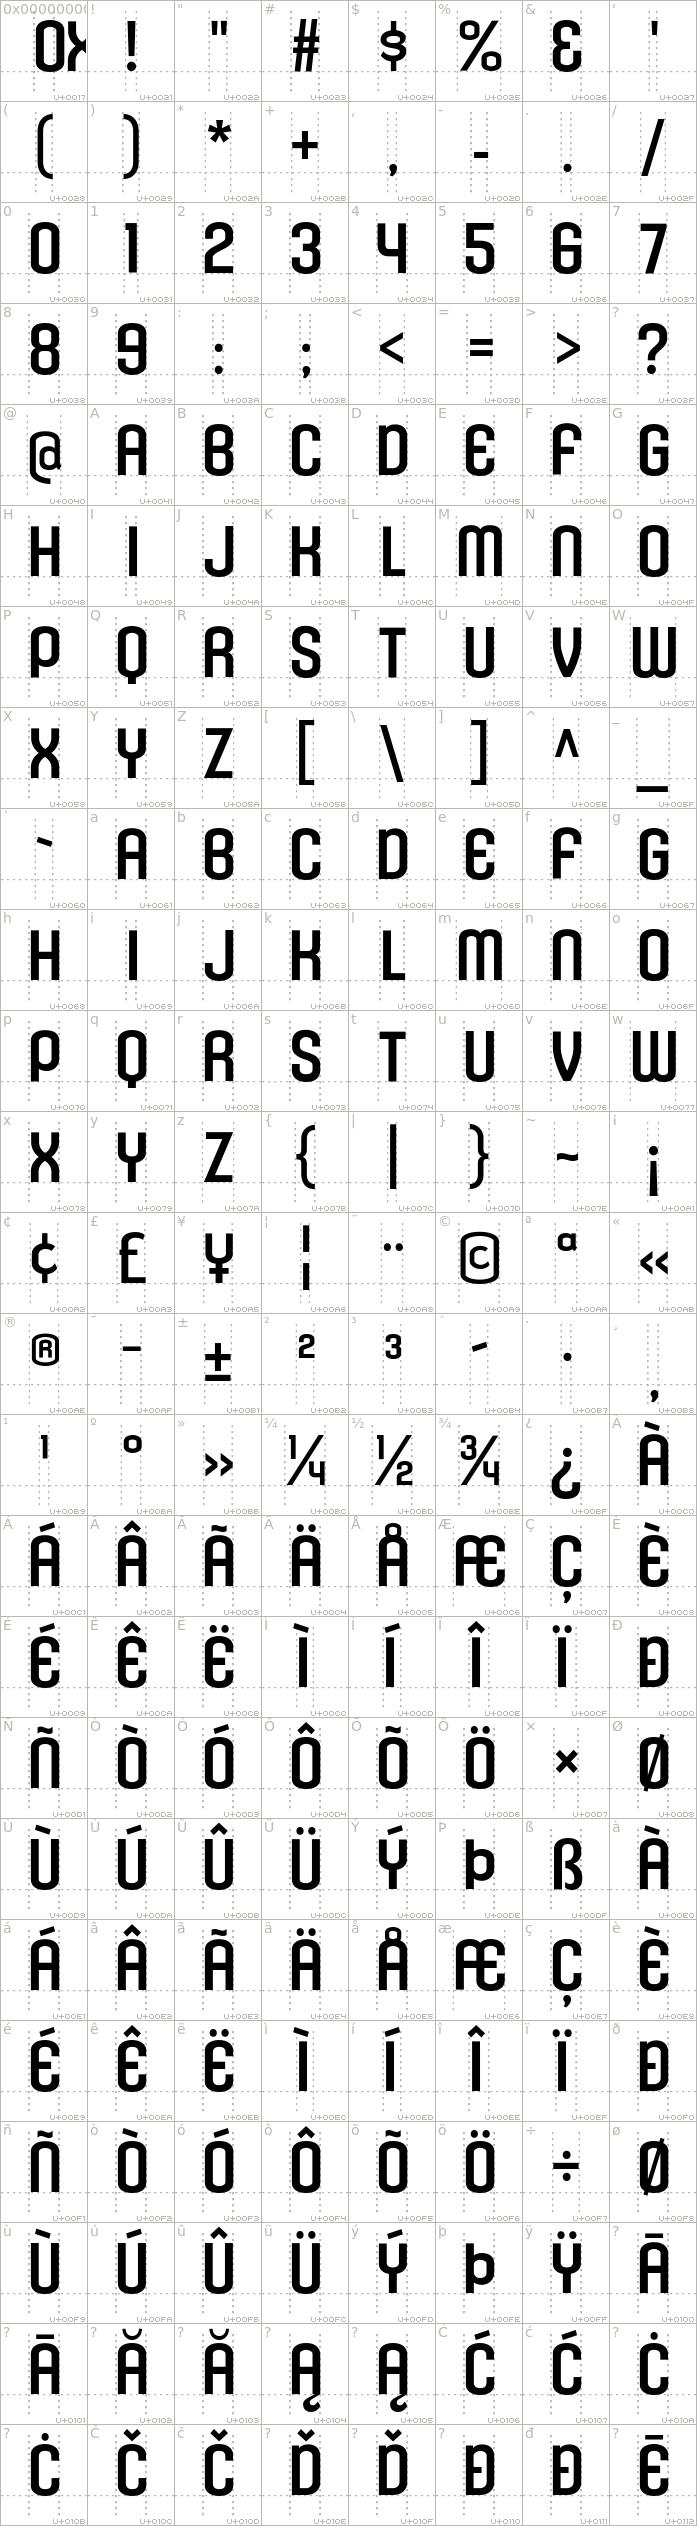 kleptocracy-titling.regular.character-map-1